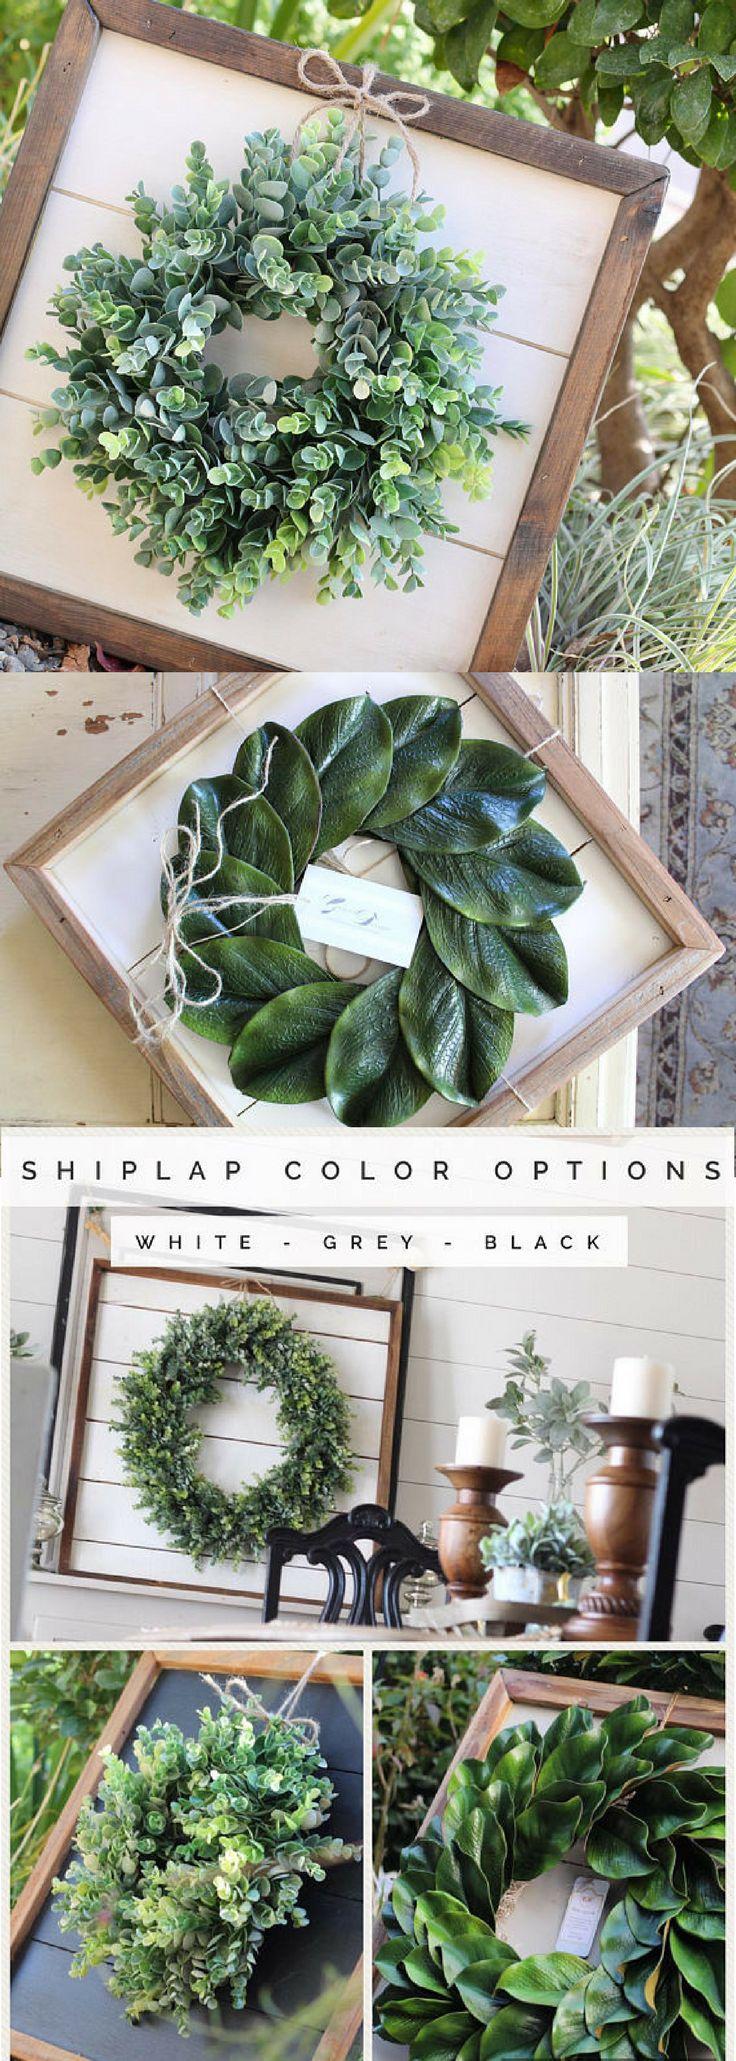 Shiplap Art & Mini Eucalyptus OR Magnolia Wreath - Small 15x15 - Reclaimed Wood - Handmade - Farmhouse - Home Decor - Custom Pieces - Spring - Living Room - Style - Kitchen - Modern - Joanna Gaines - Rustic - Country - Vintage - Ideas #ad